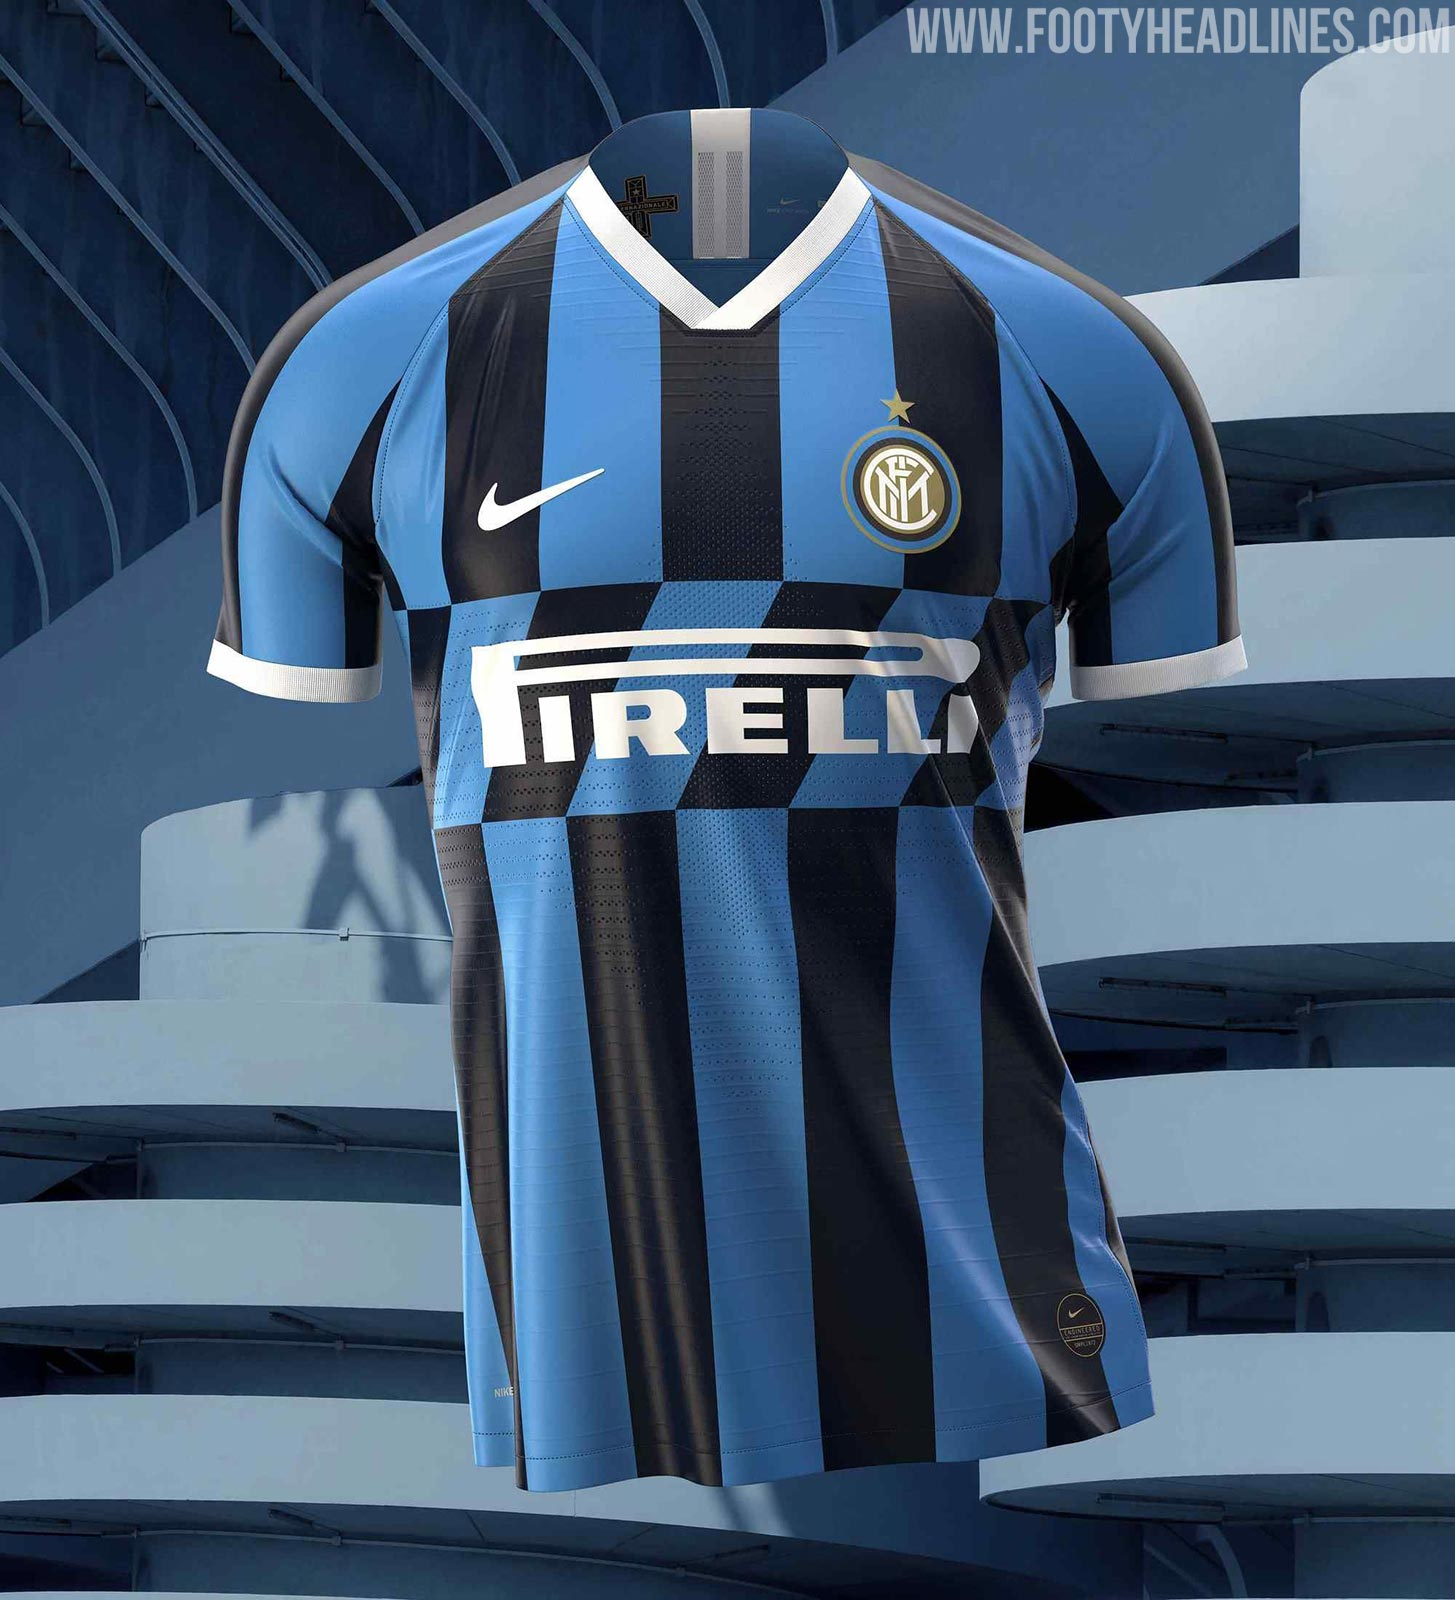 Inter Milan 19 20 Home Kit Revealed Footy Headlines